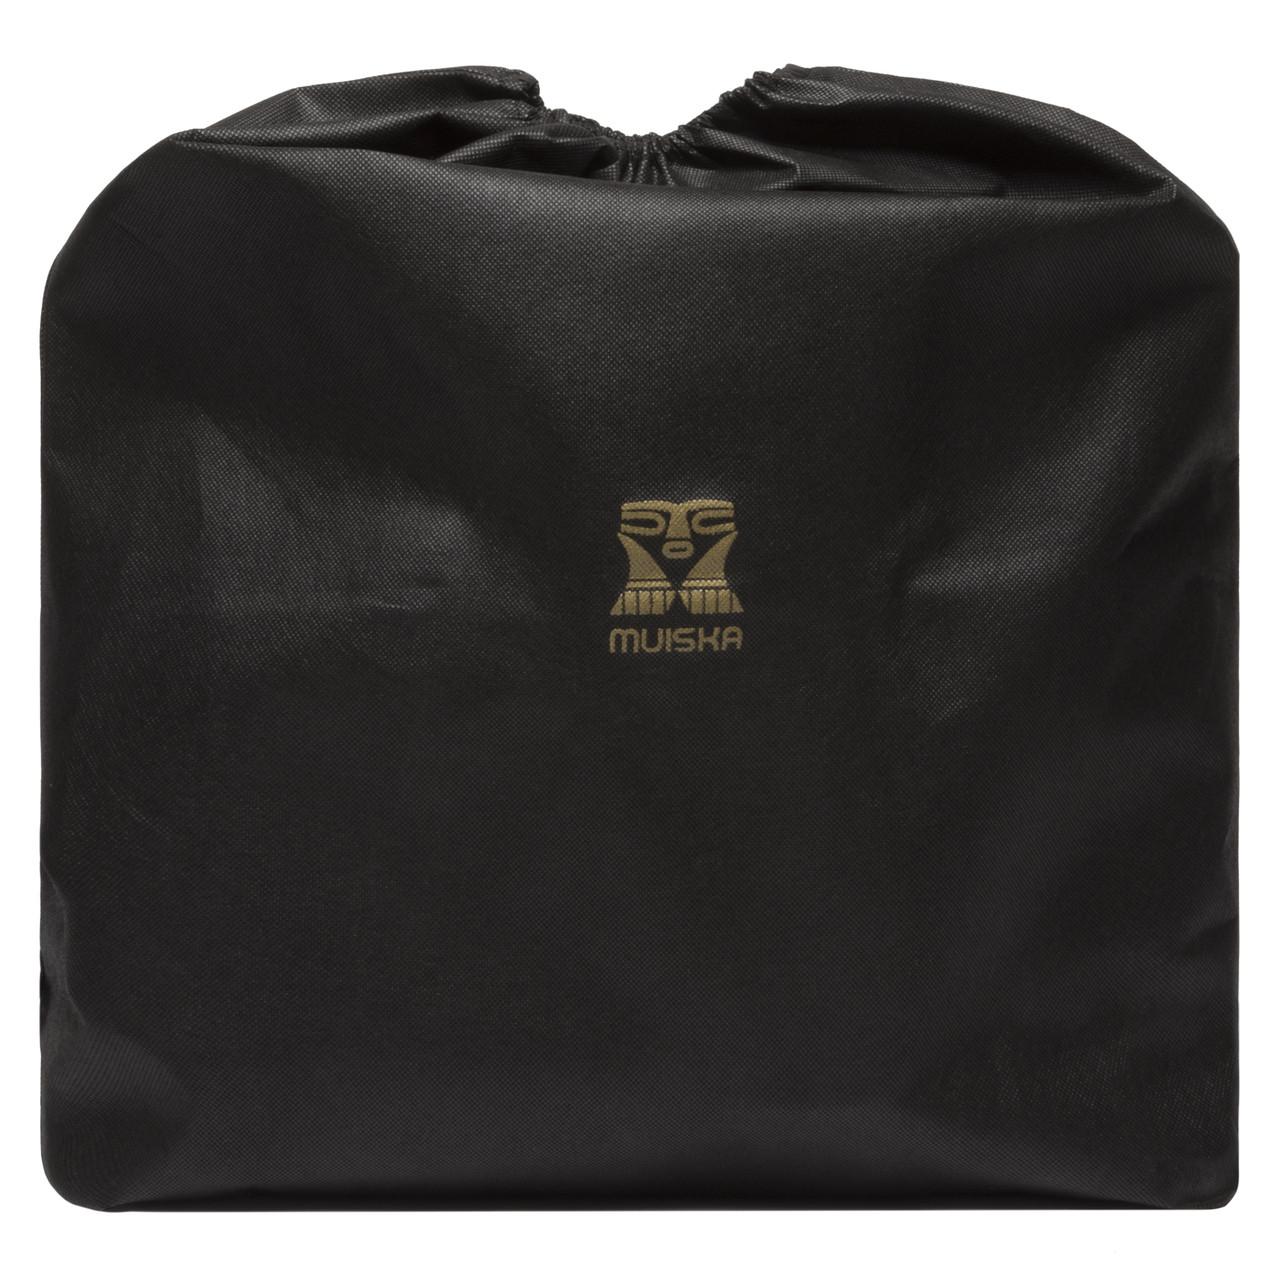 Muiska - Taipei - branded protective dust bag